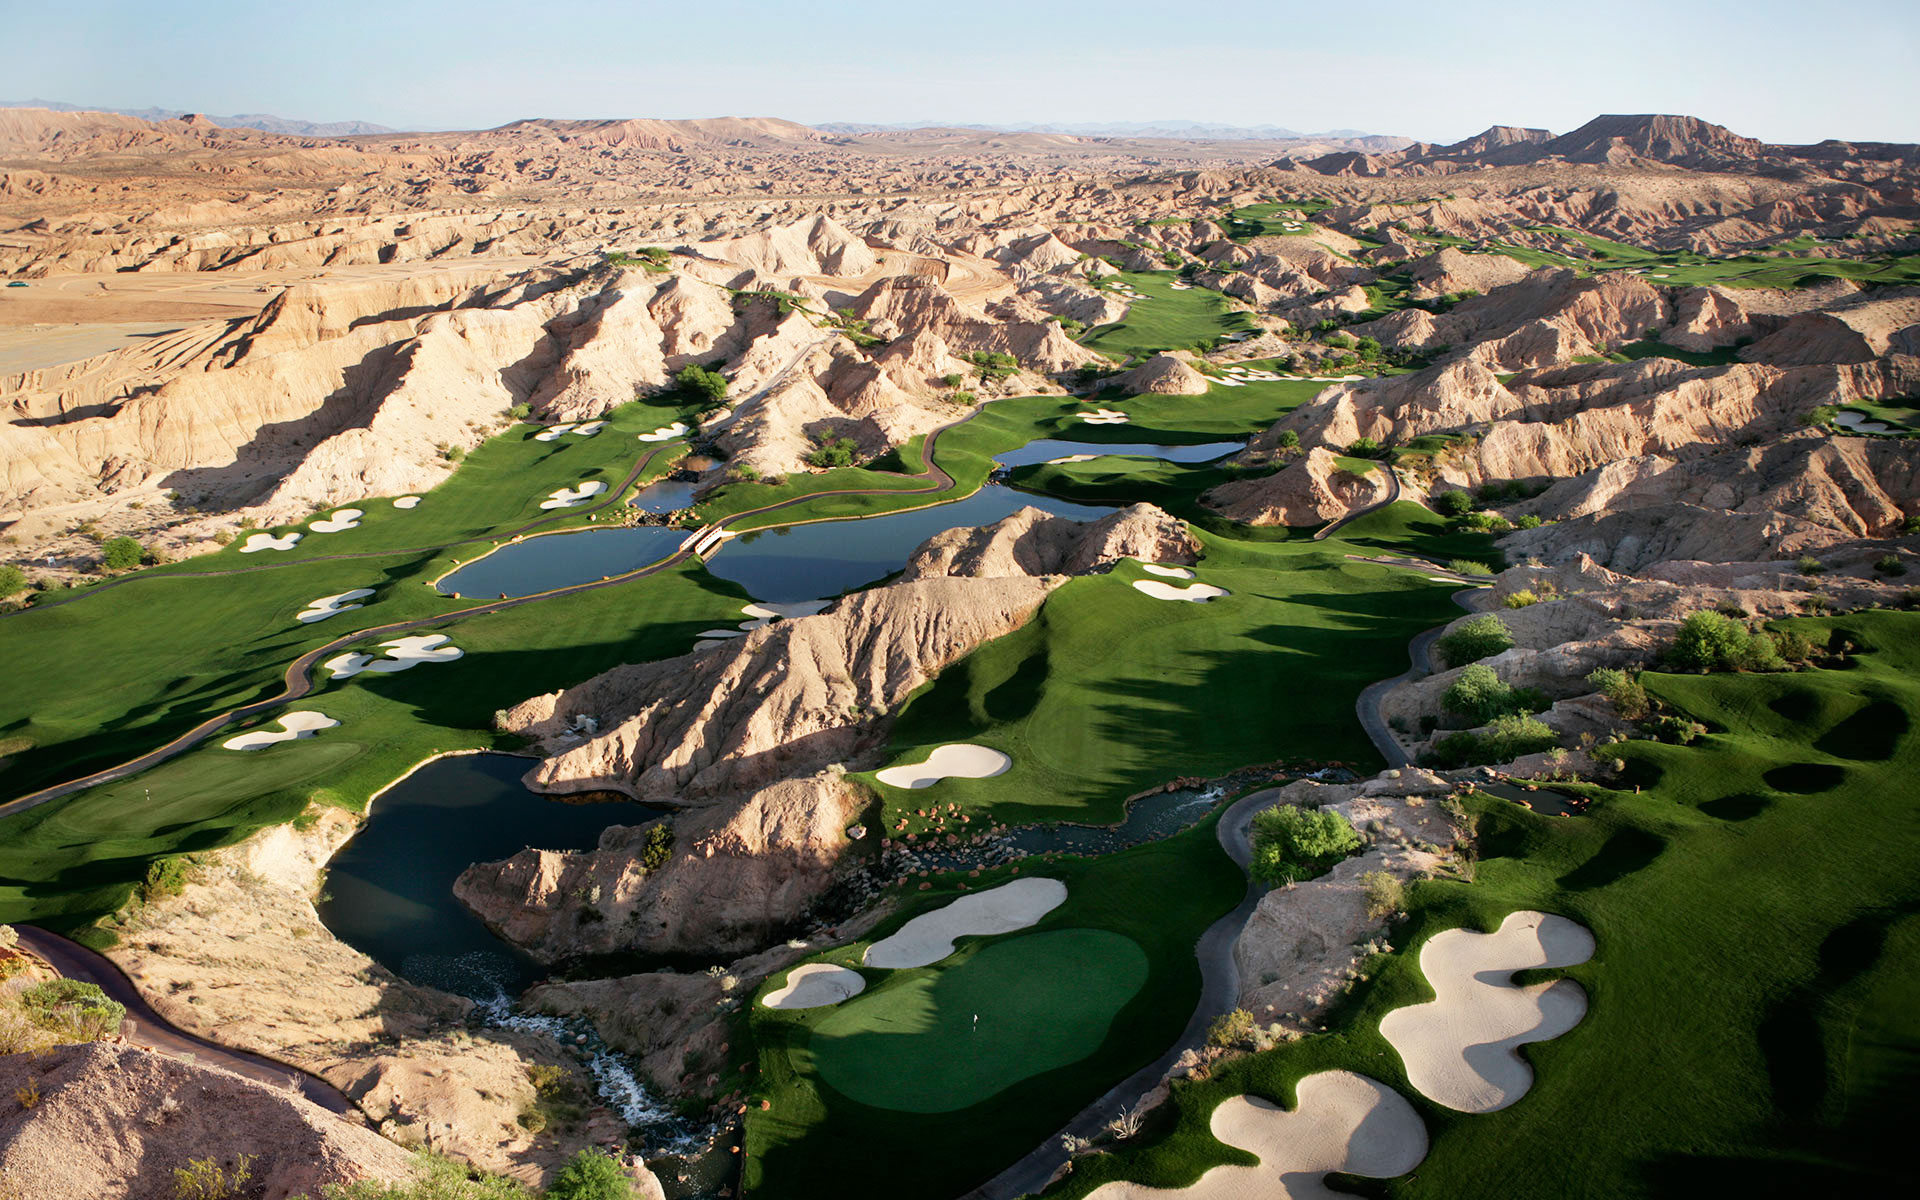 Wolf Creek, étape 8 à Las Vegas